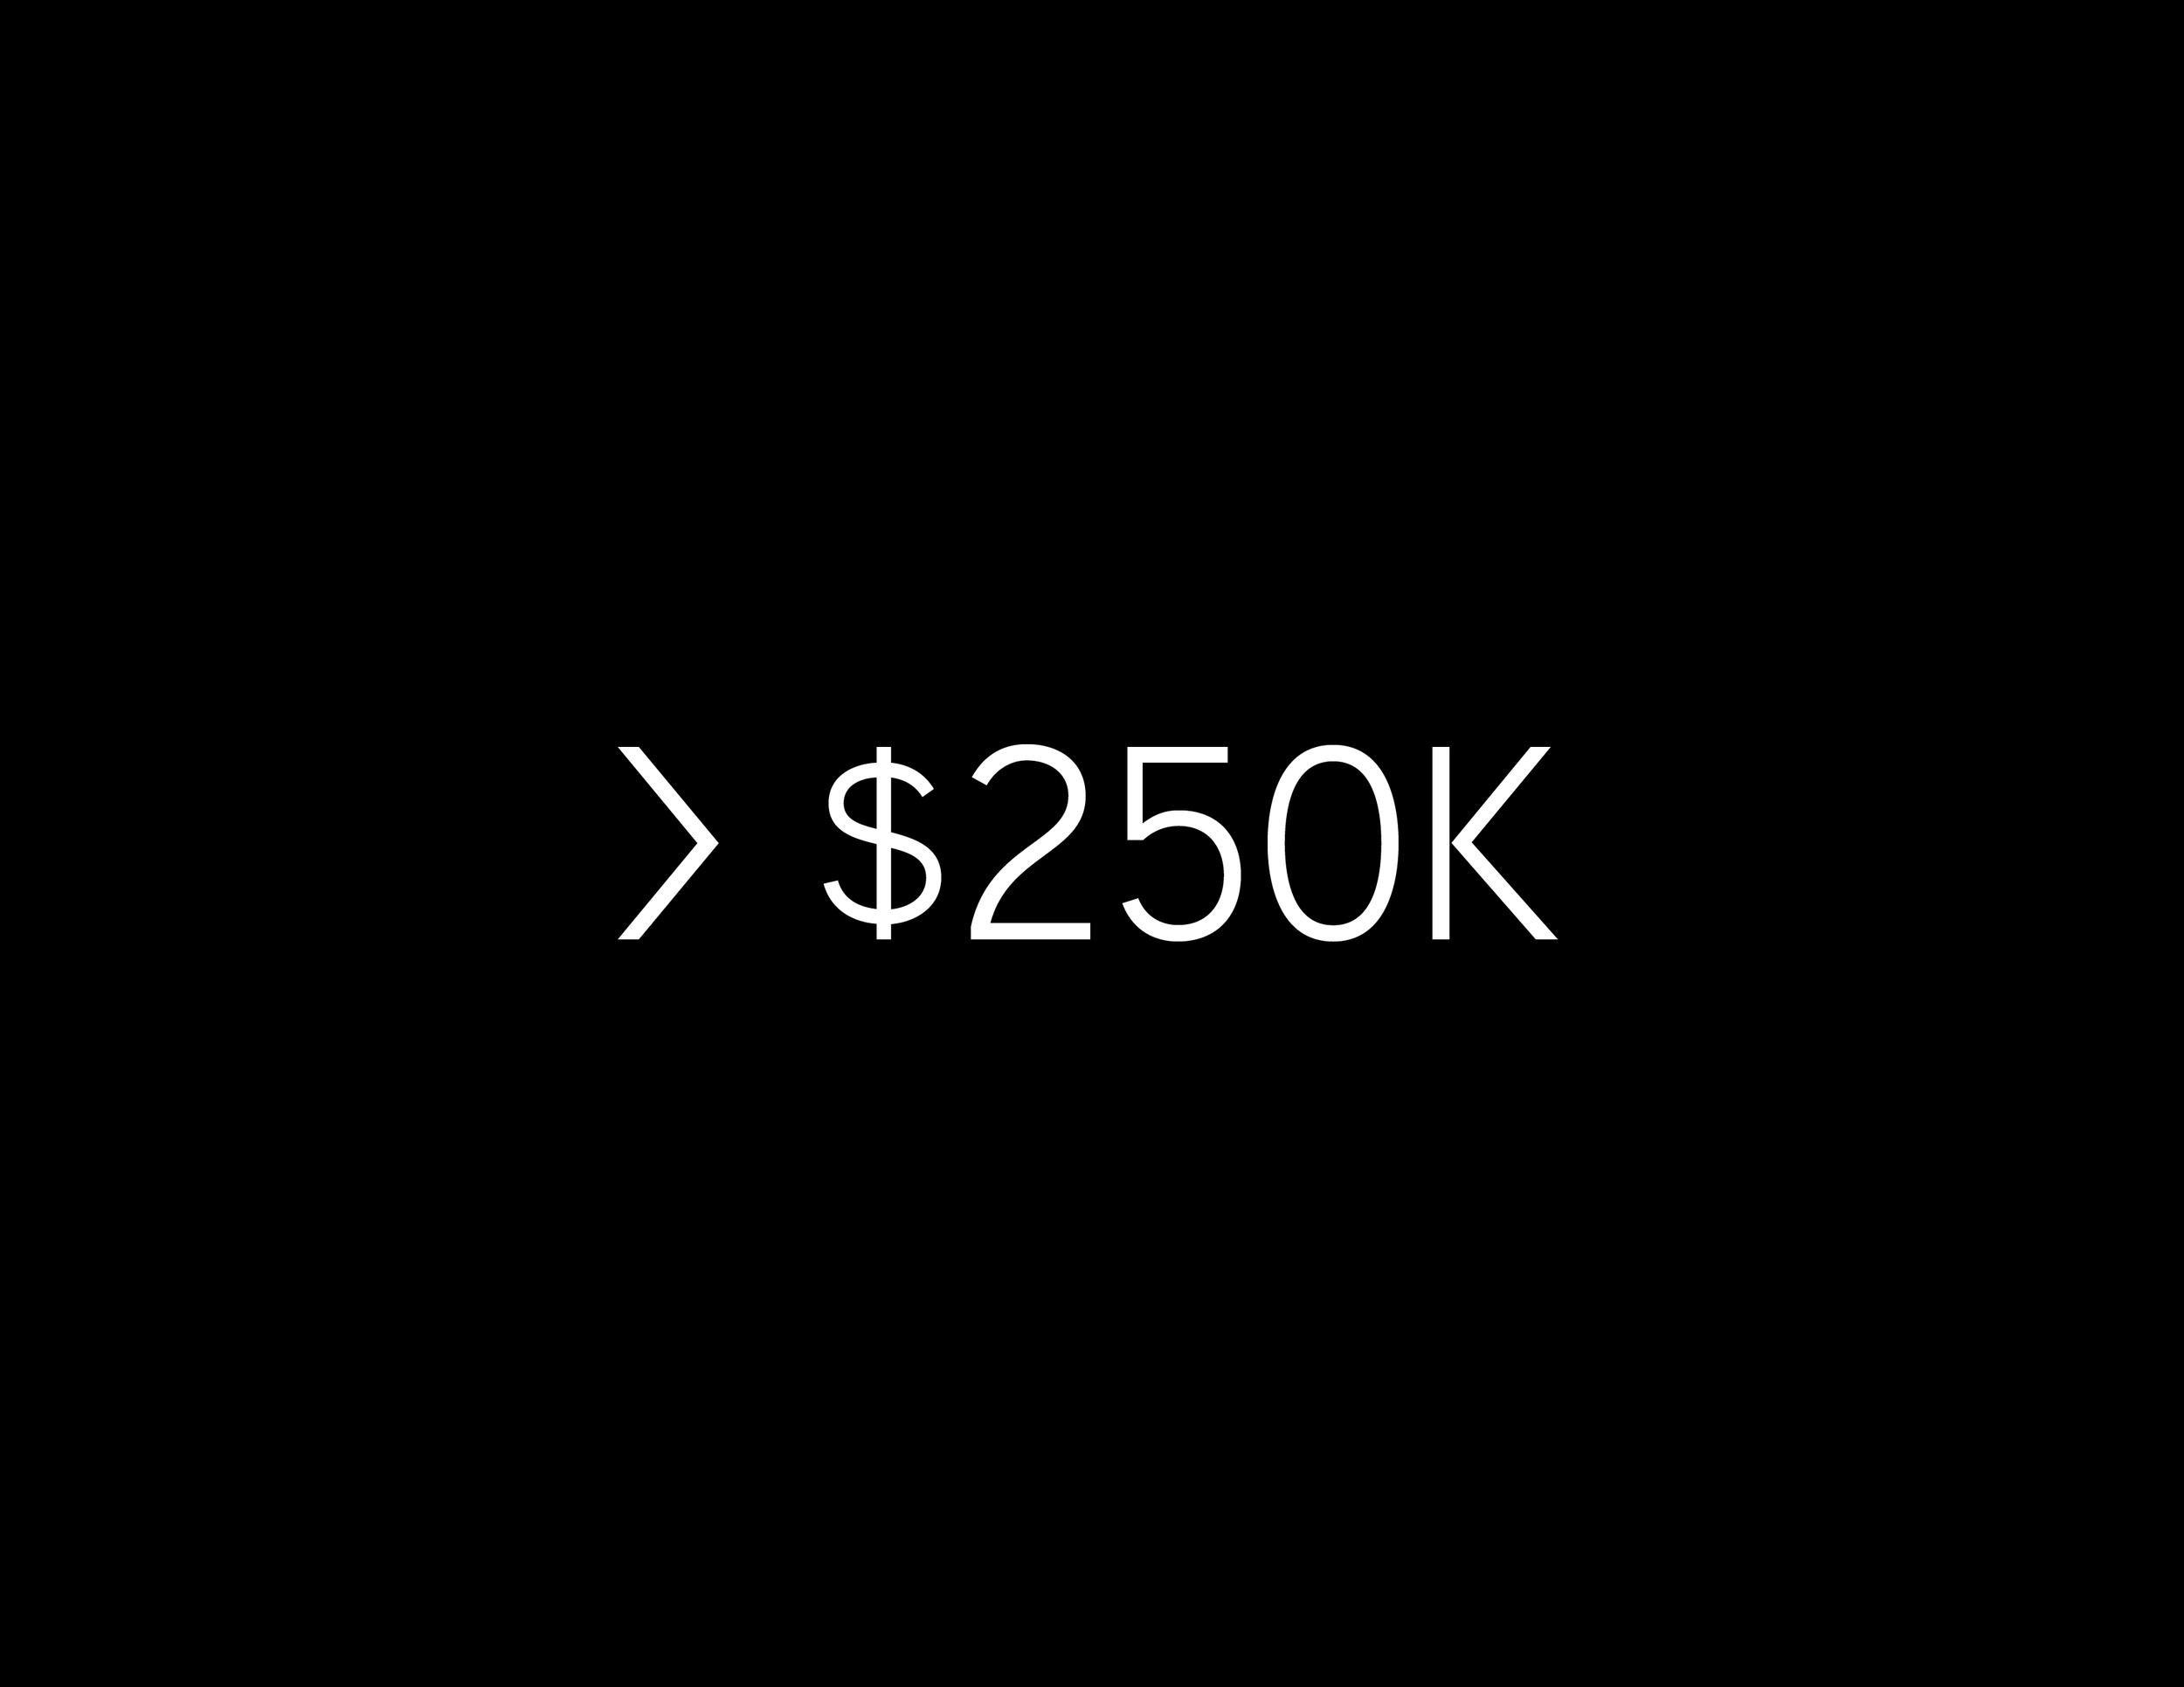 BlackBox- Less Than 250K.jpg